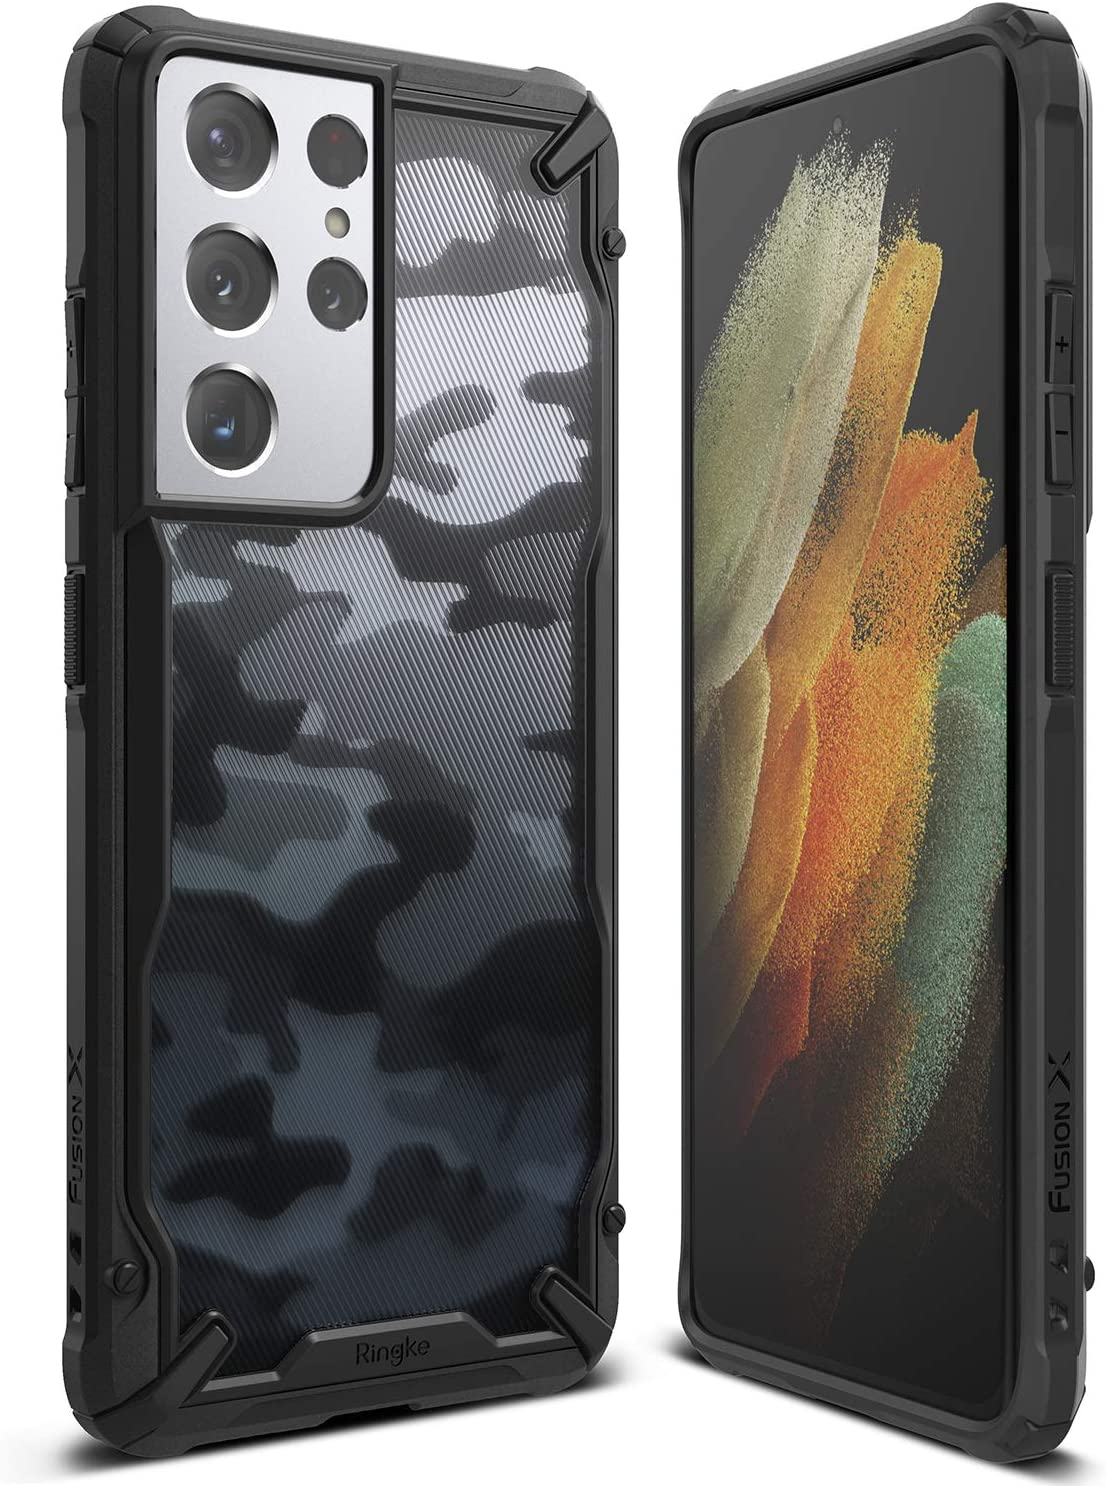 Funda Ringke Fusion-x Para Galaxy S21 Ultra 5g-Camuflada